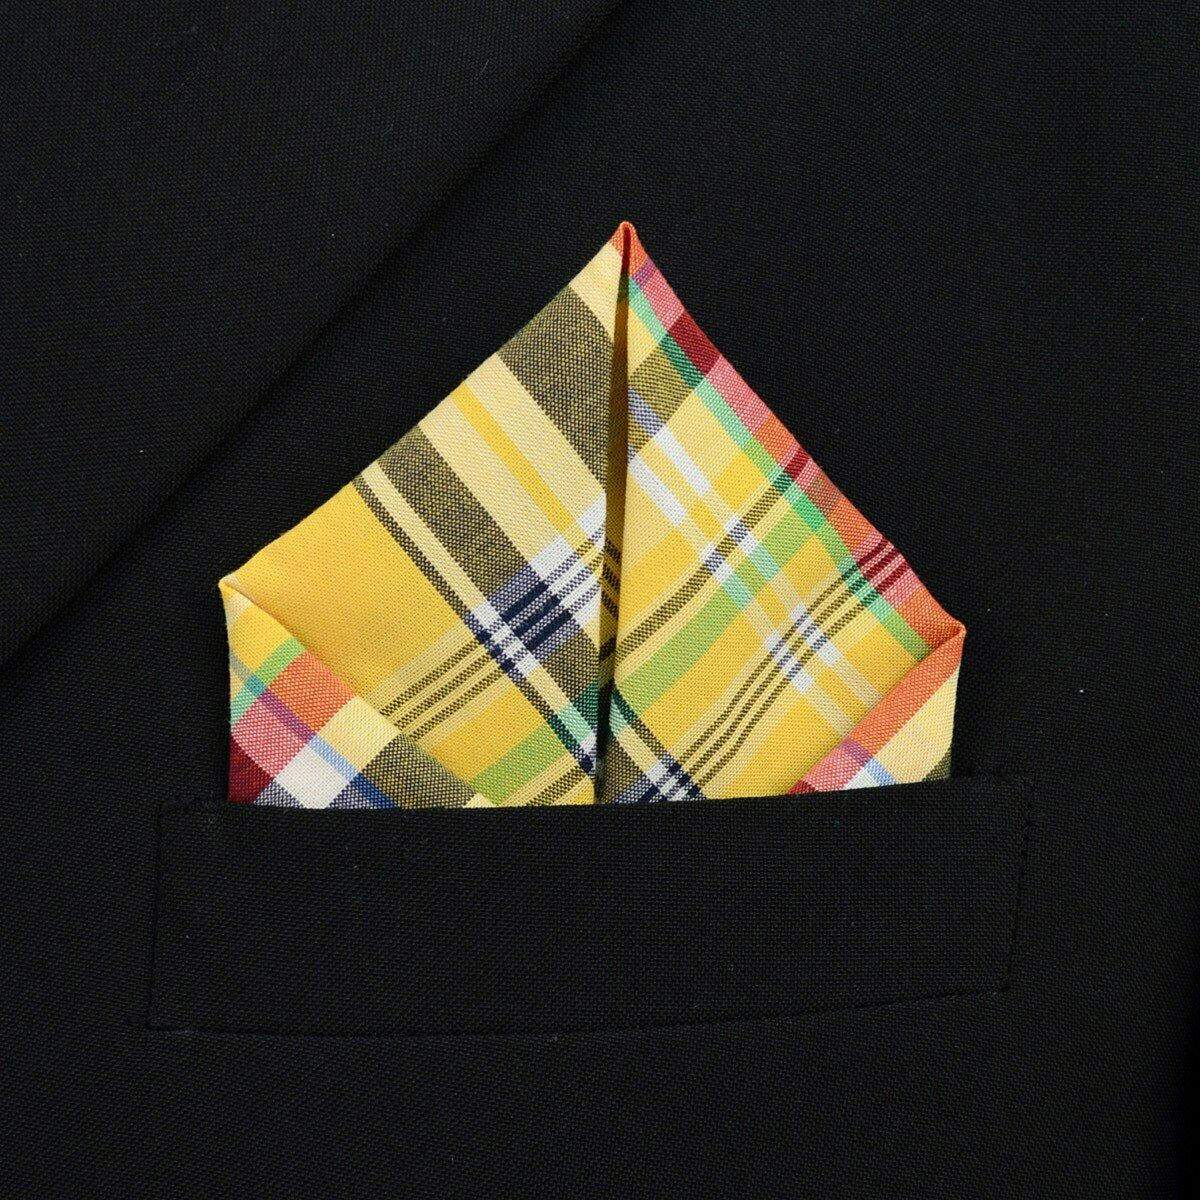 100% Cotton Quality Plaid Pocket Square Stitched edges Fashion Handkerchiefs